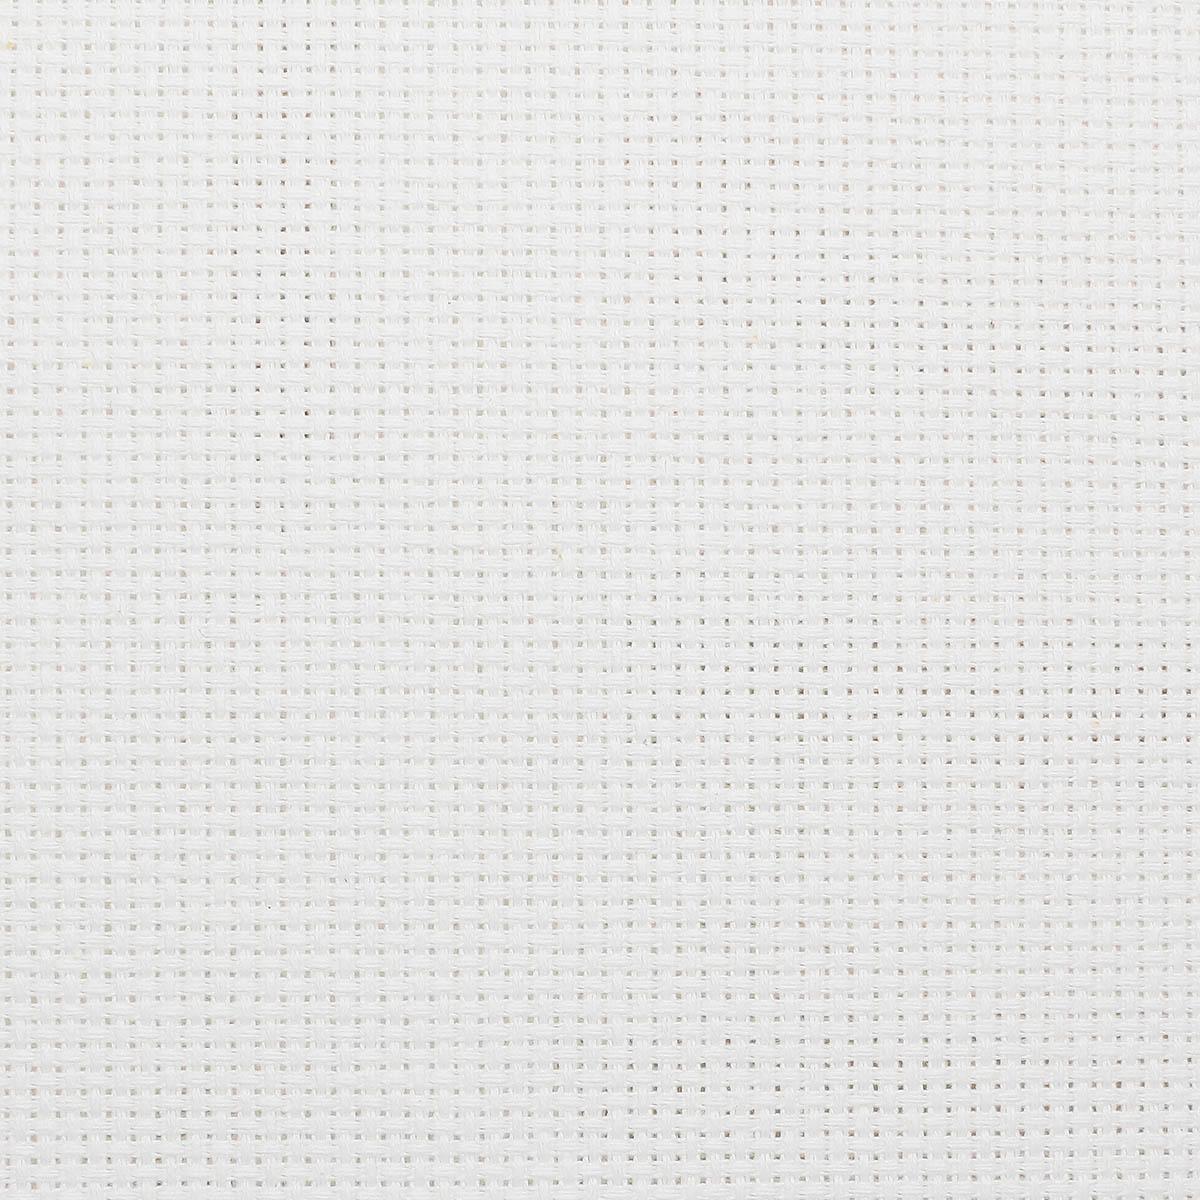 Канва Aida 14ct, 150*100см белая Bestex